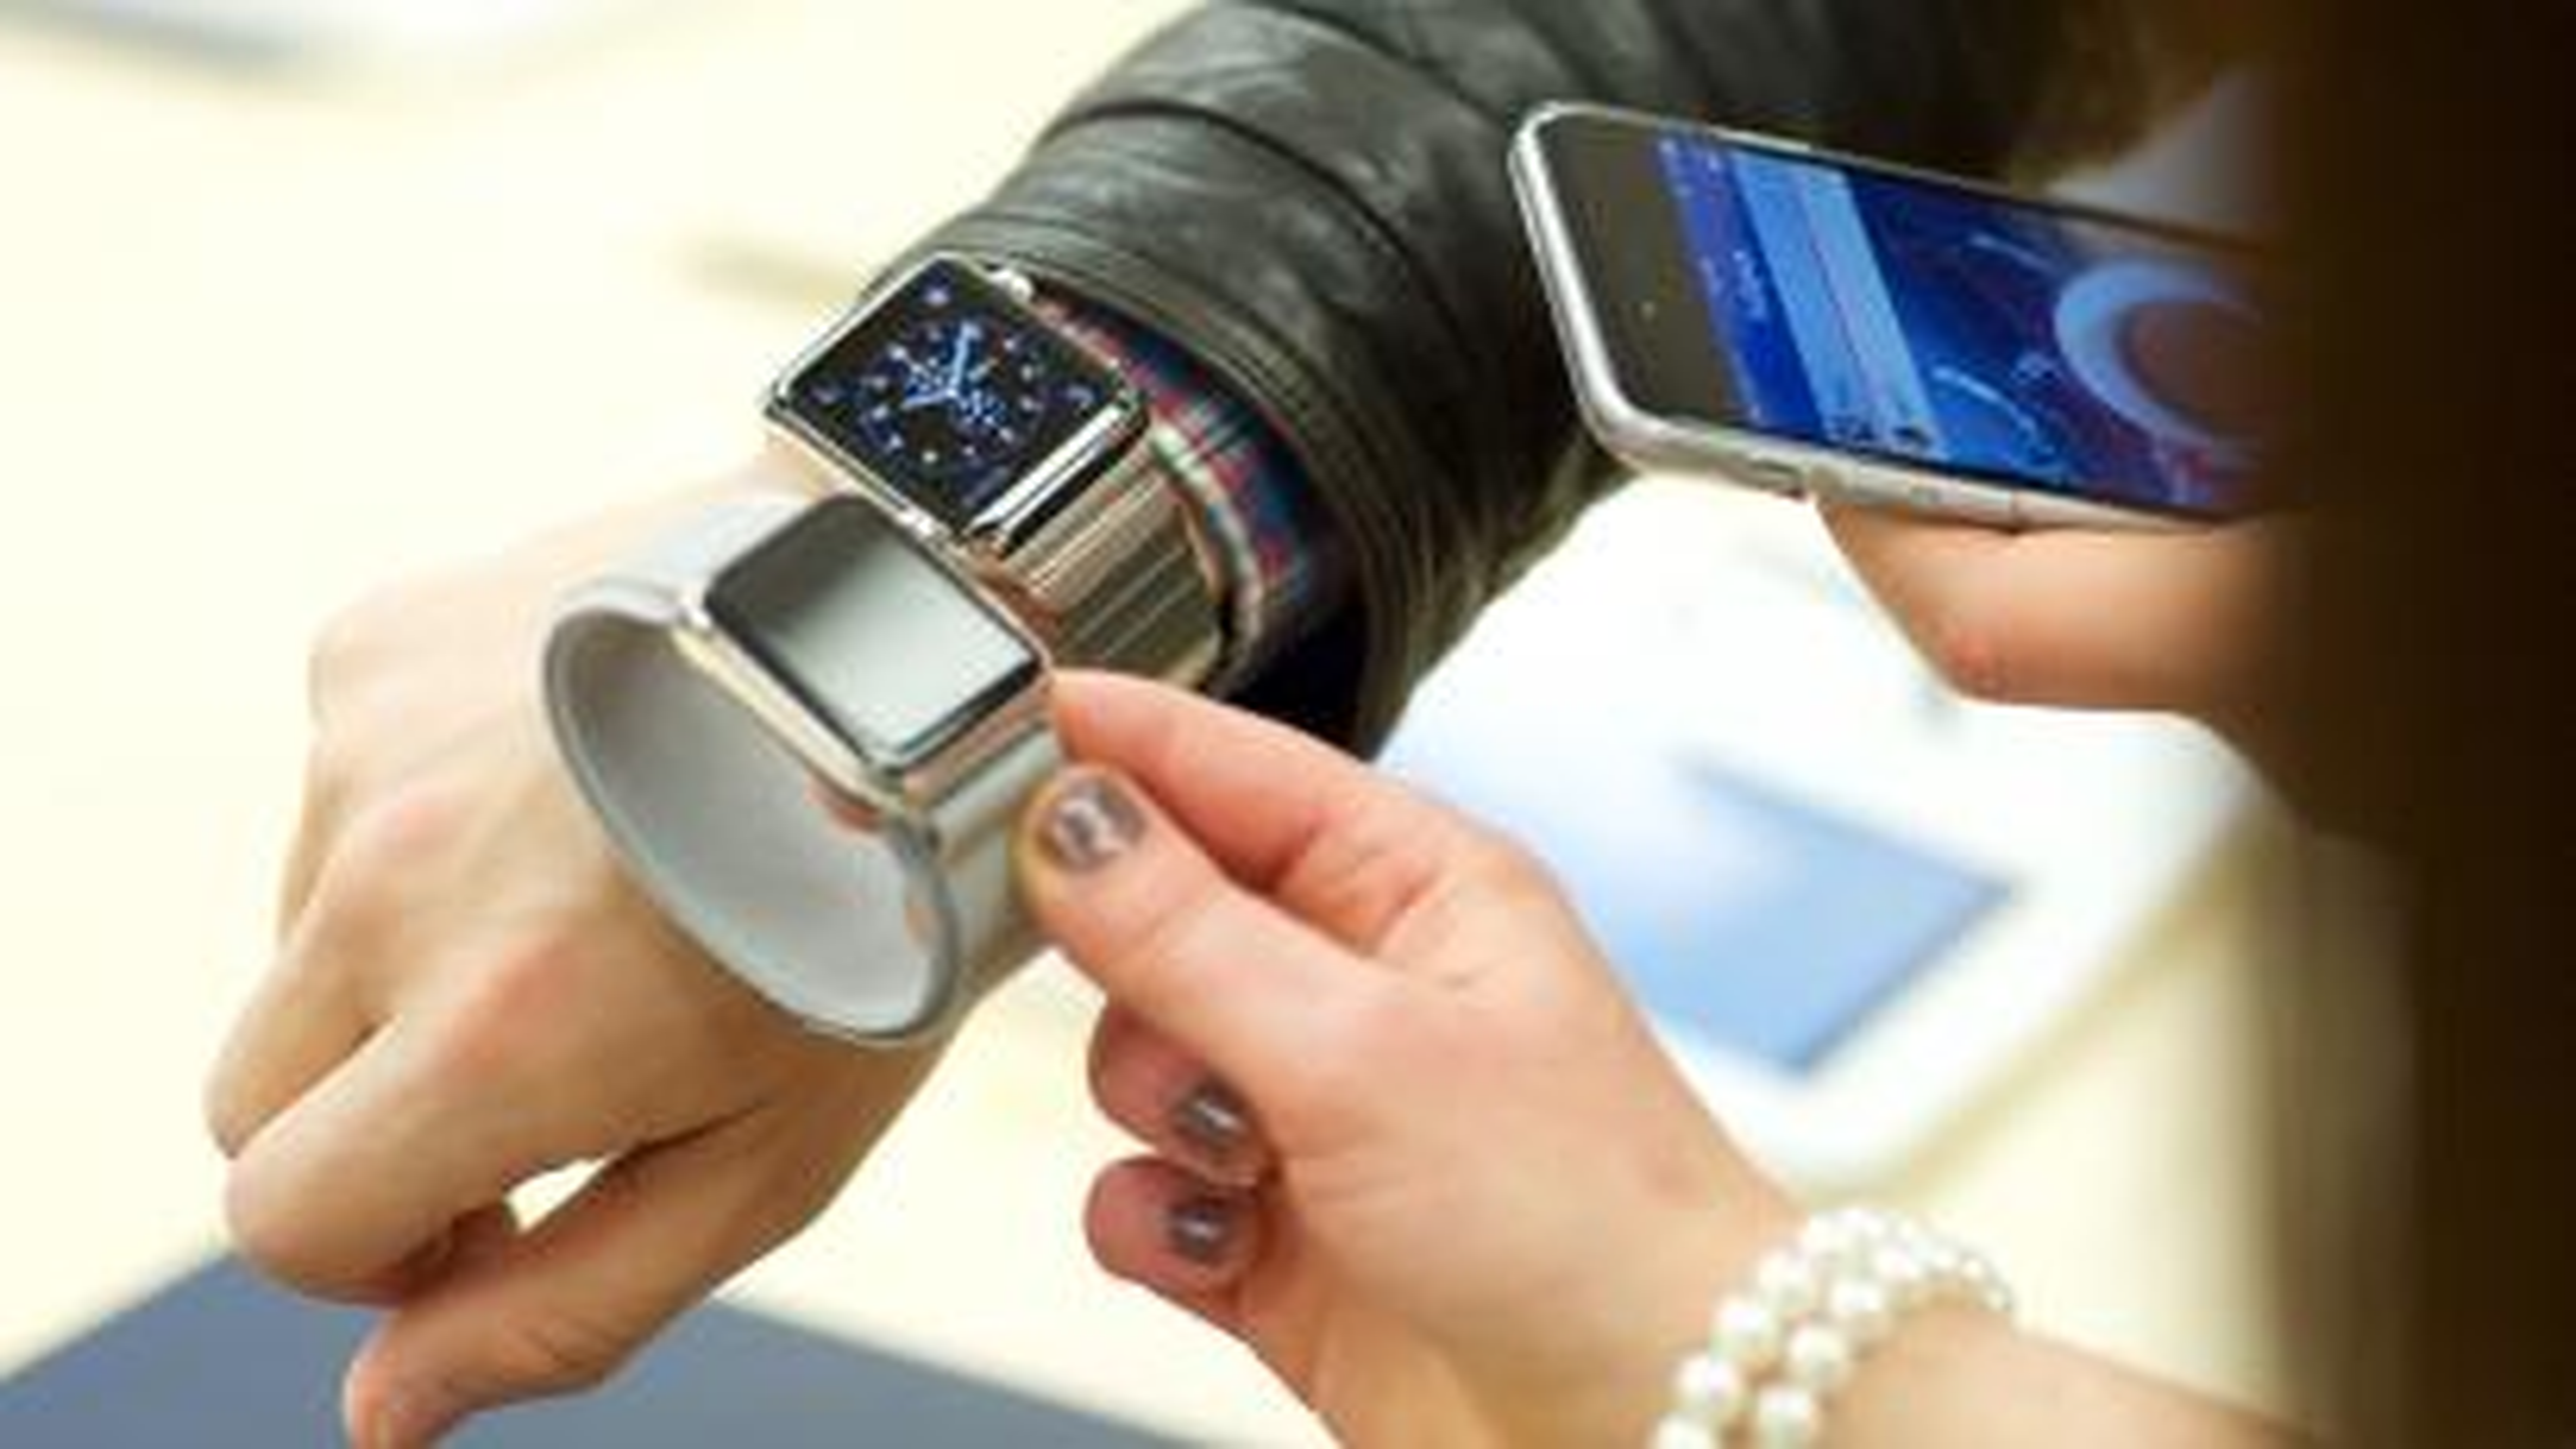 Apple Watch fitting